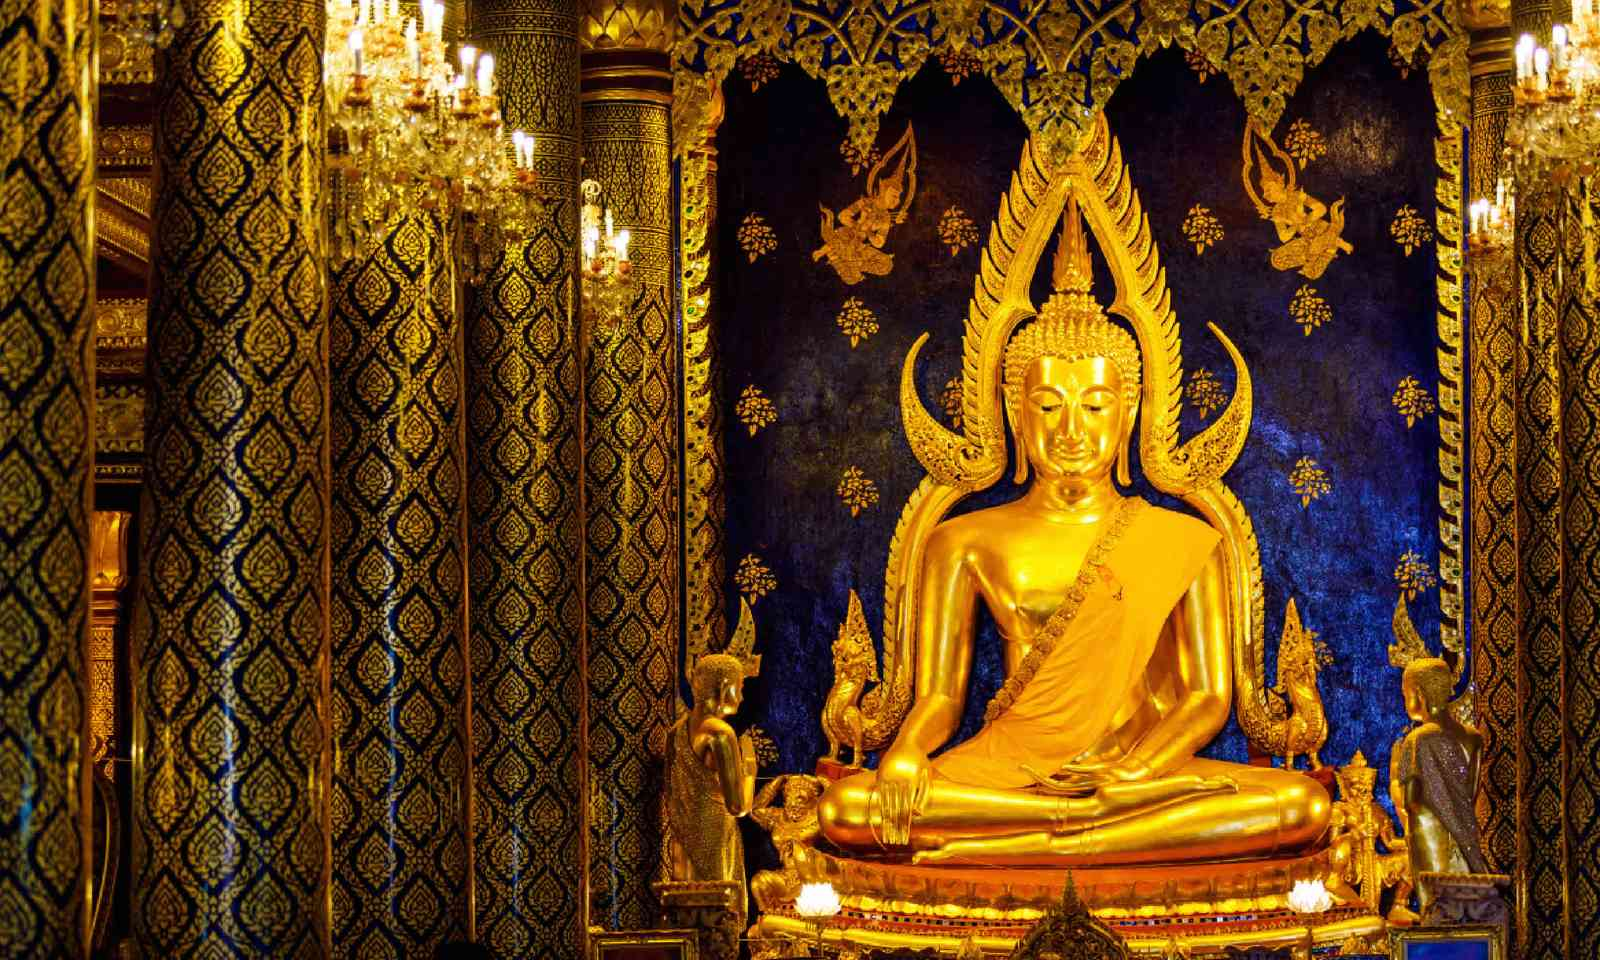 Phra Buddha Chinnarat at Phra Si Rattana Mahathat temple (Shutterstock)